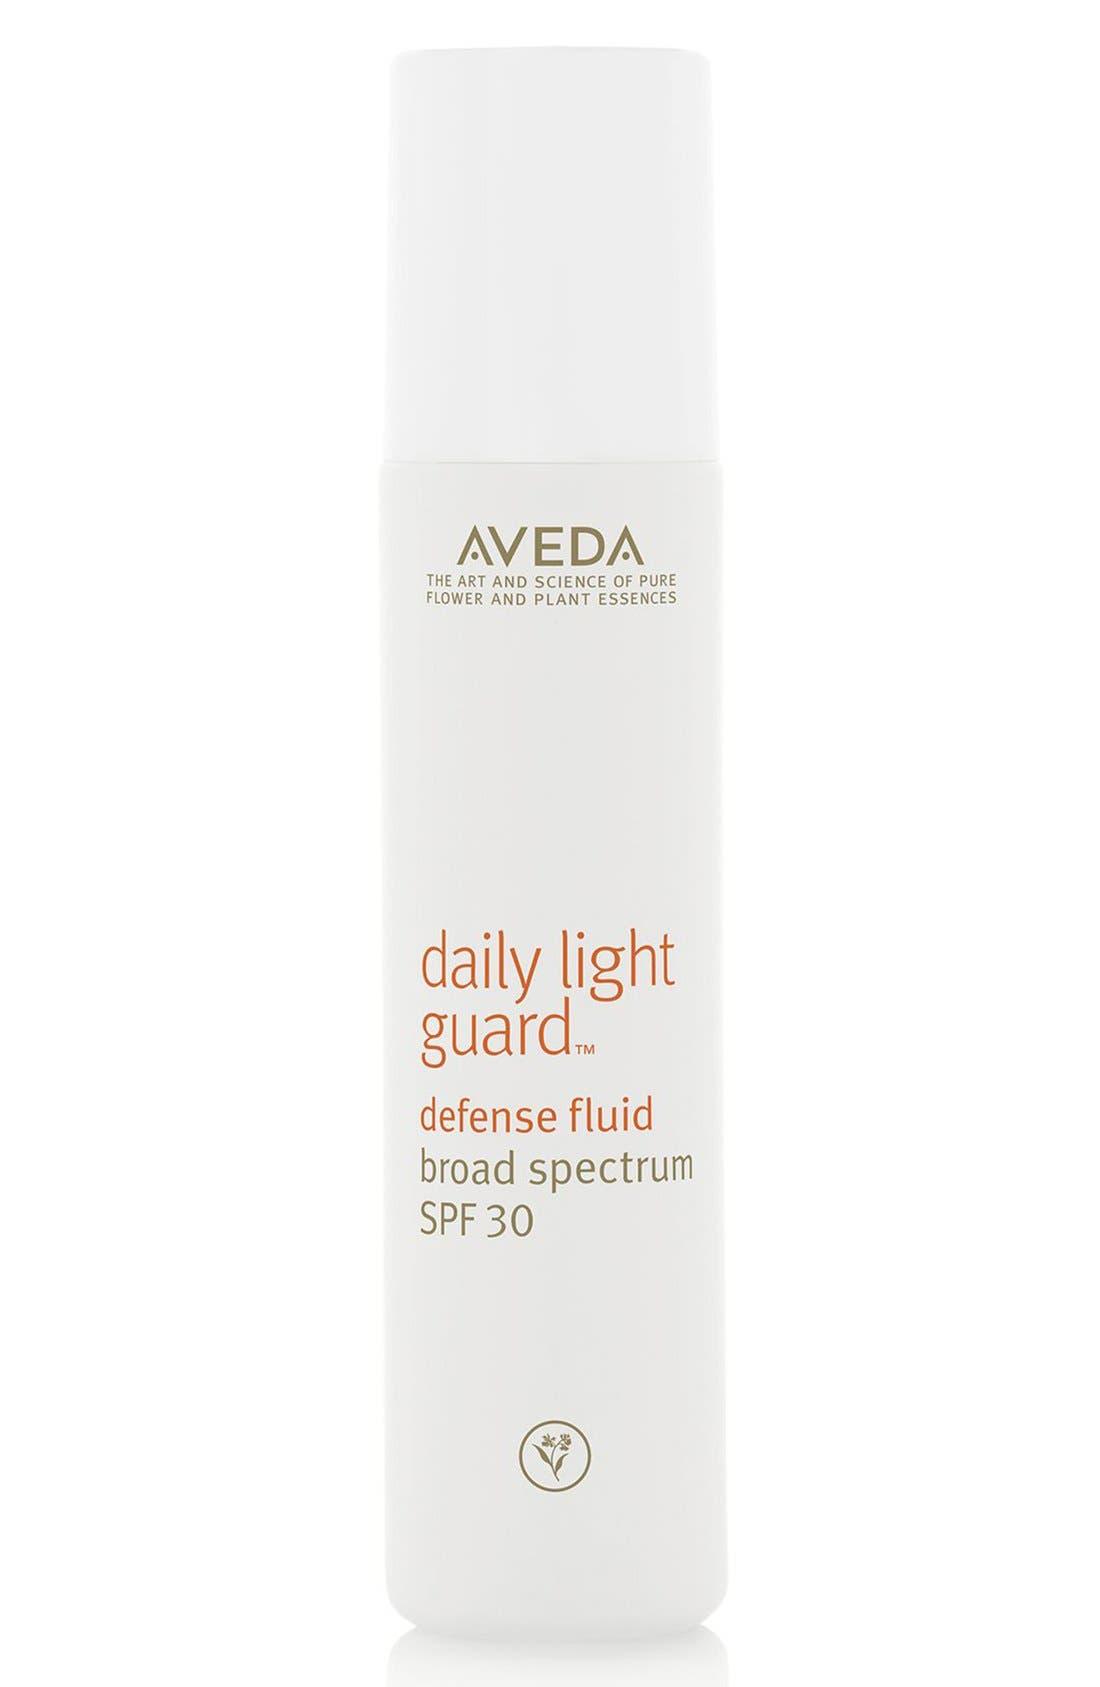 Aveda 'daily light guard™' Defense Fluid Broad Spectrum SPF 30